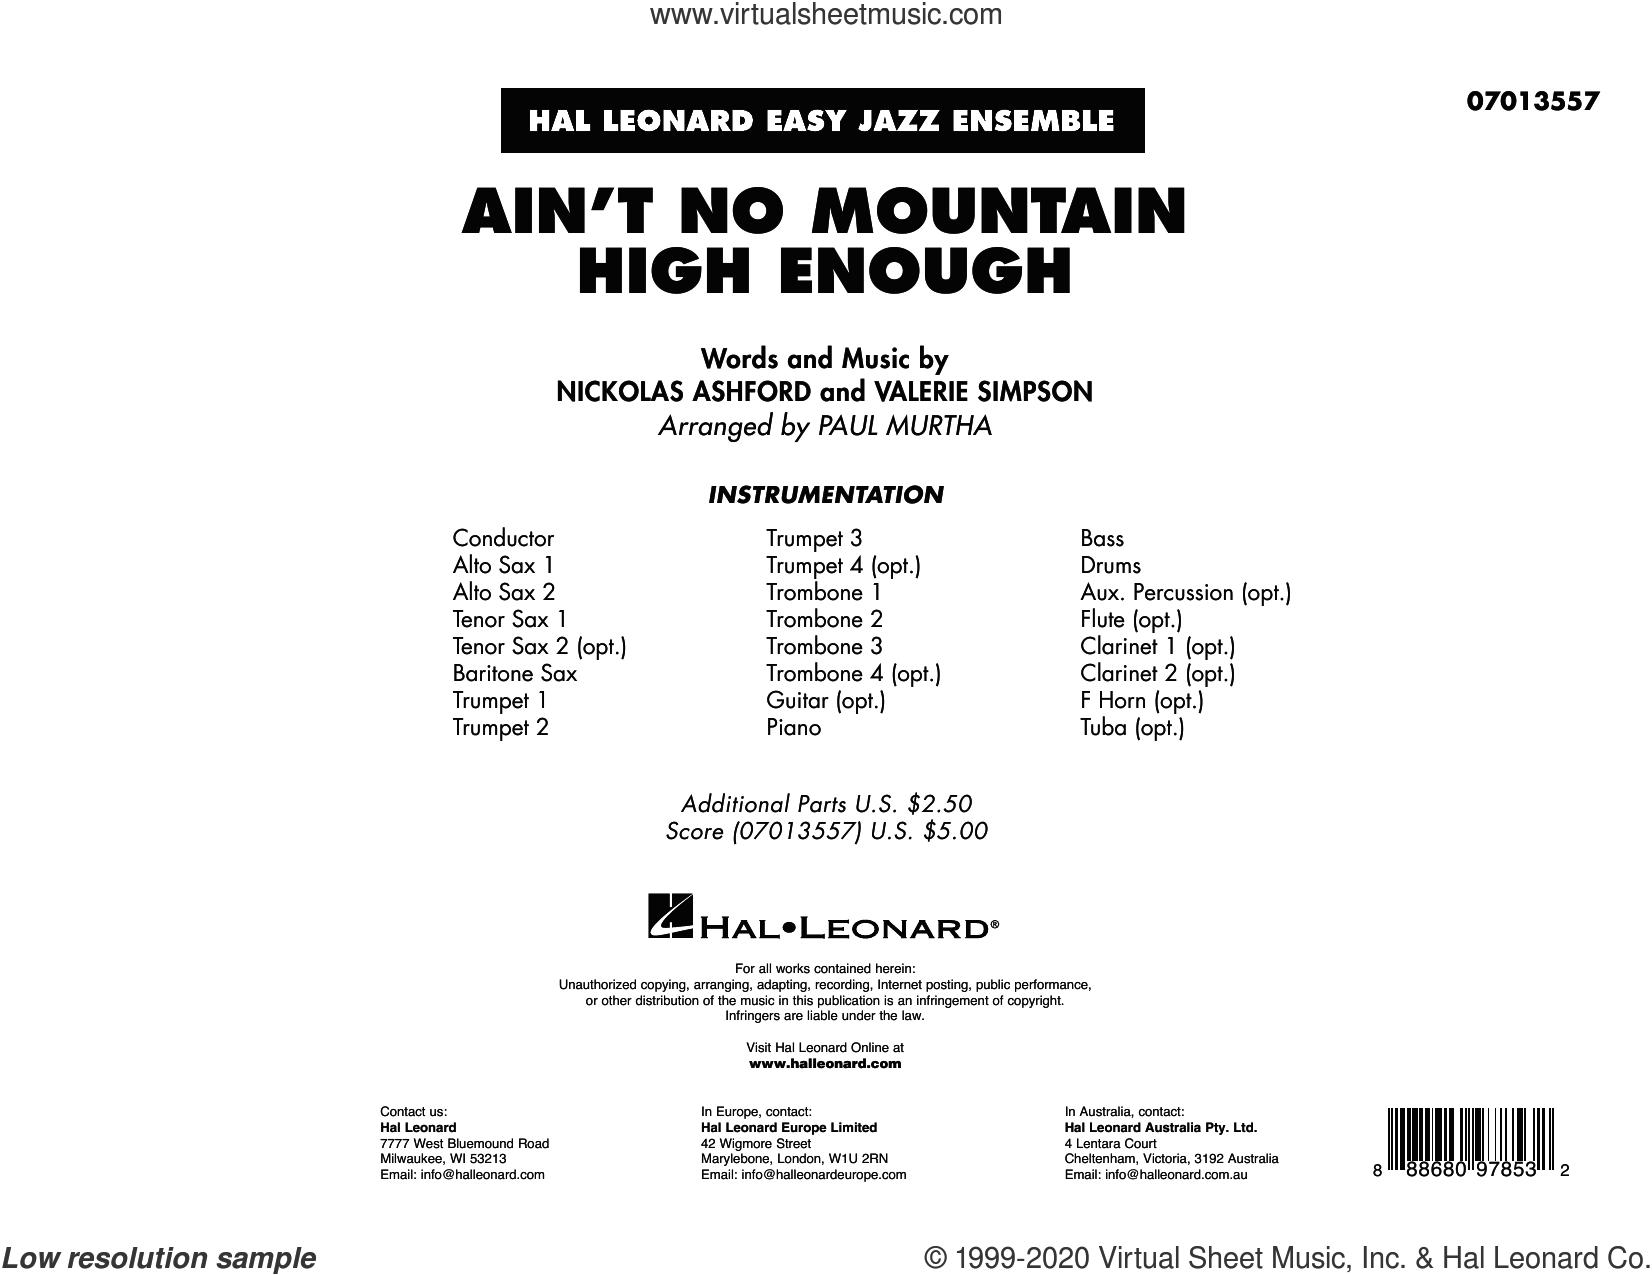 Ain't No Mountain High Enough (arr. Paul Murtha) (COMPLETE) sheet music for jazz band by Paul Murtha, Marvin Gaye & Tammi Terrell, Nickolas Ashford and Valerie Simpson, intermediate skill level